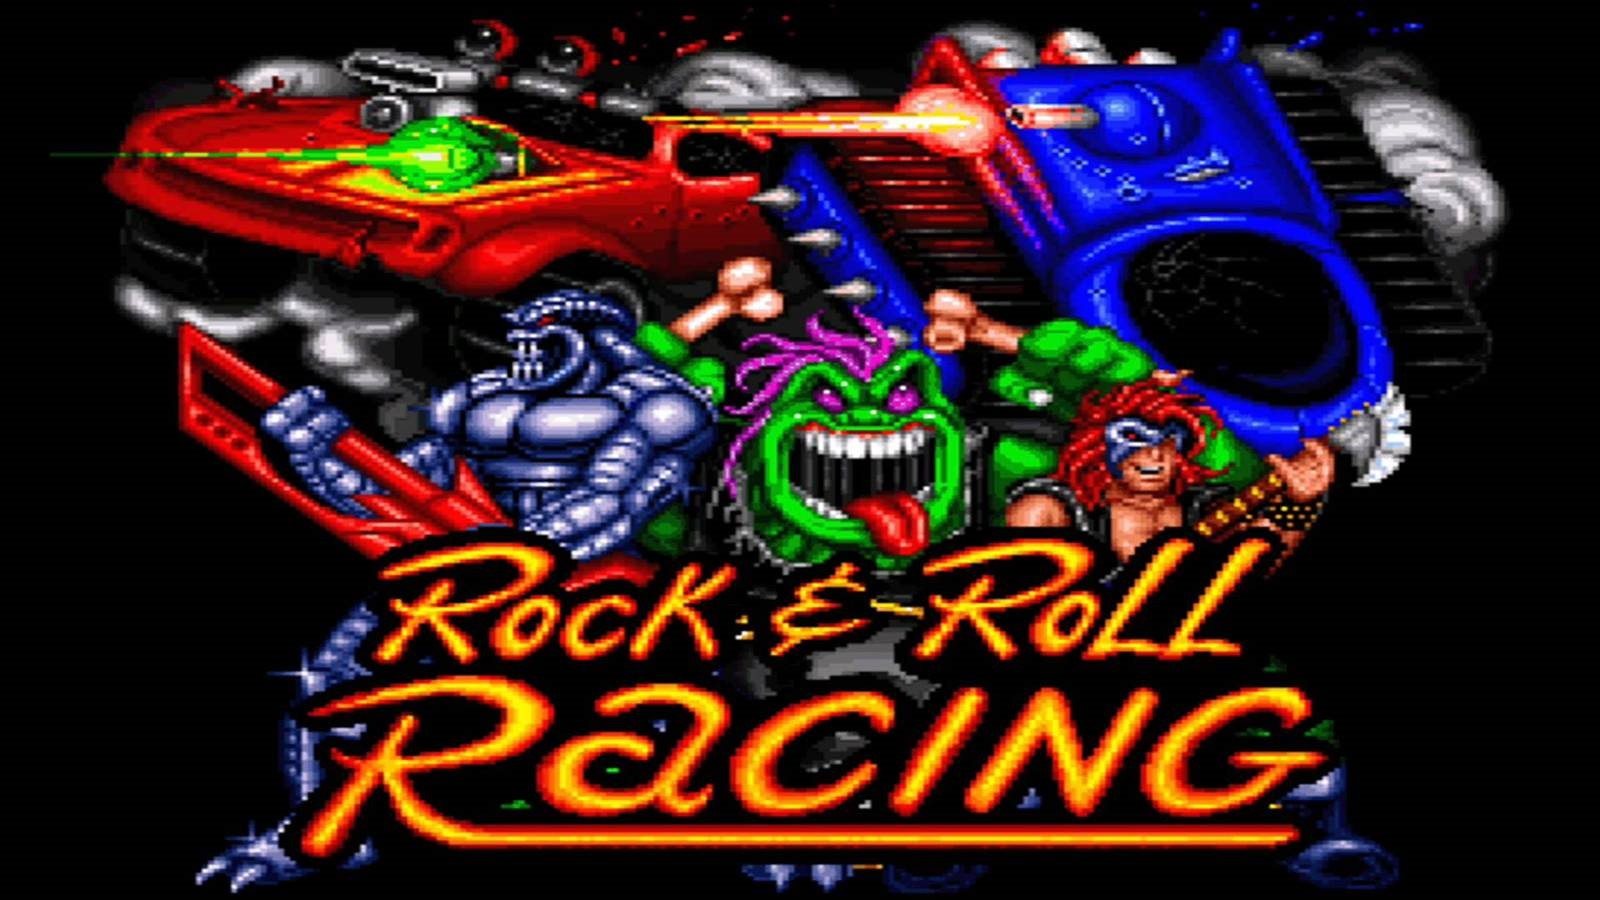 Картинки по запросу rock n roll racing